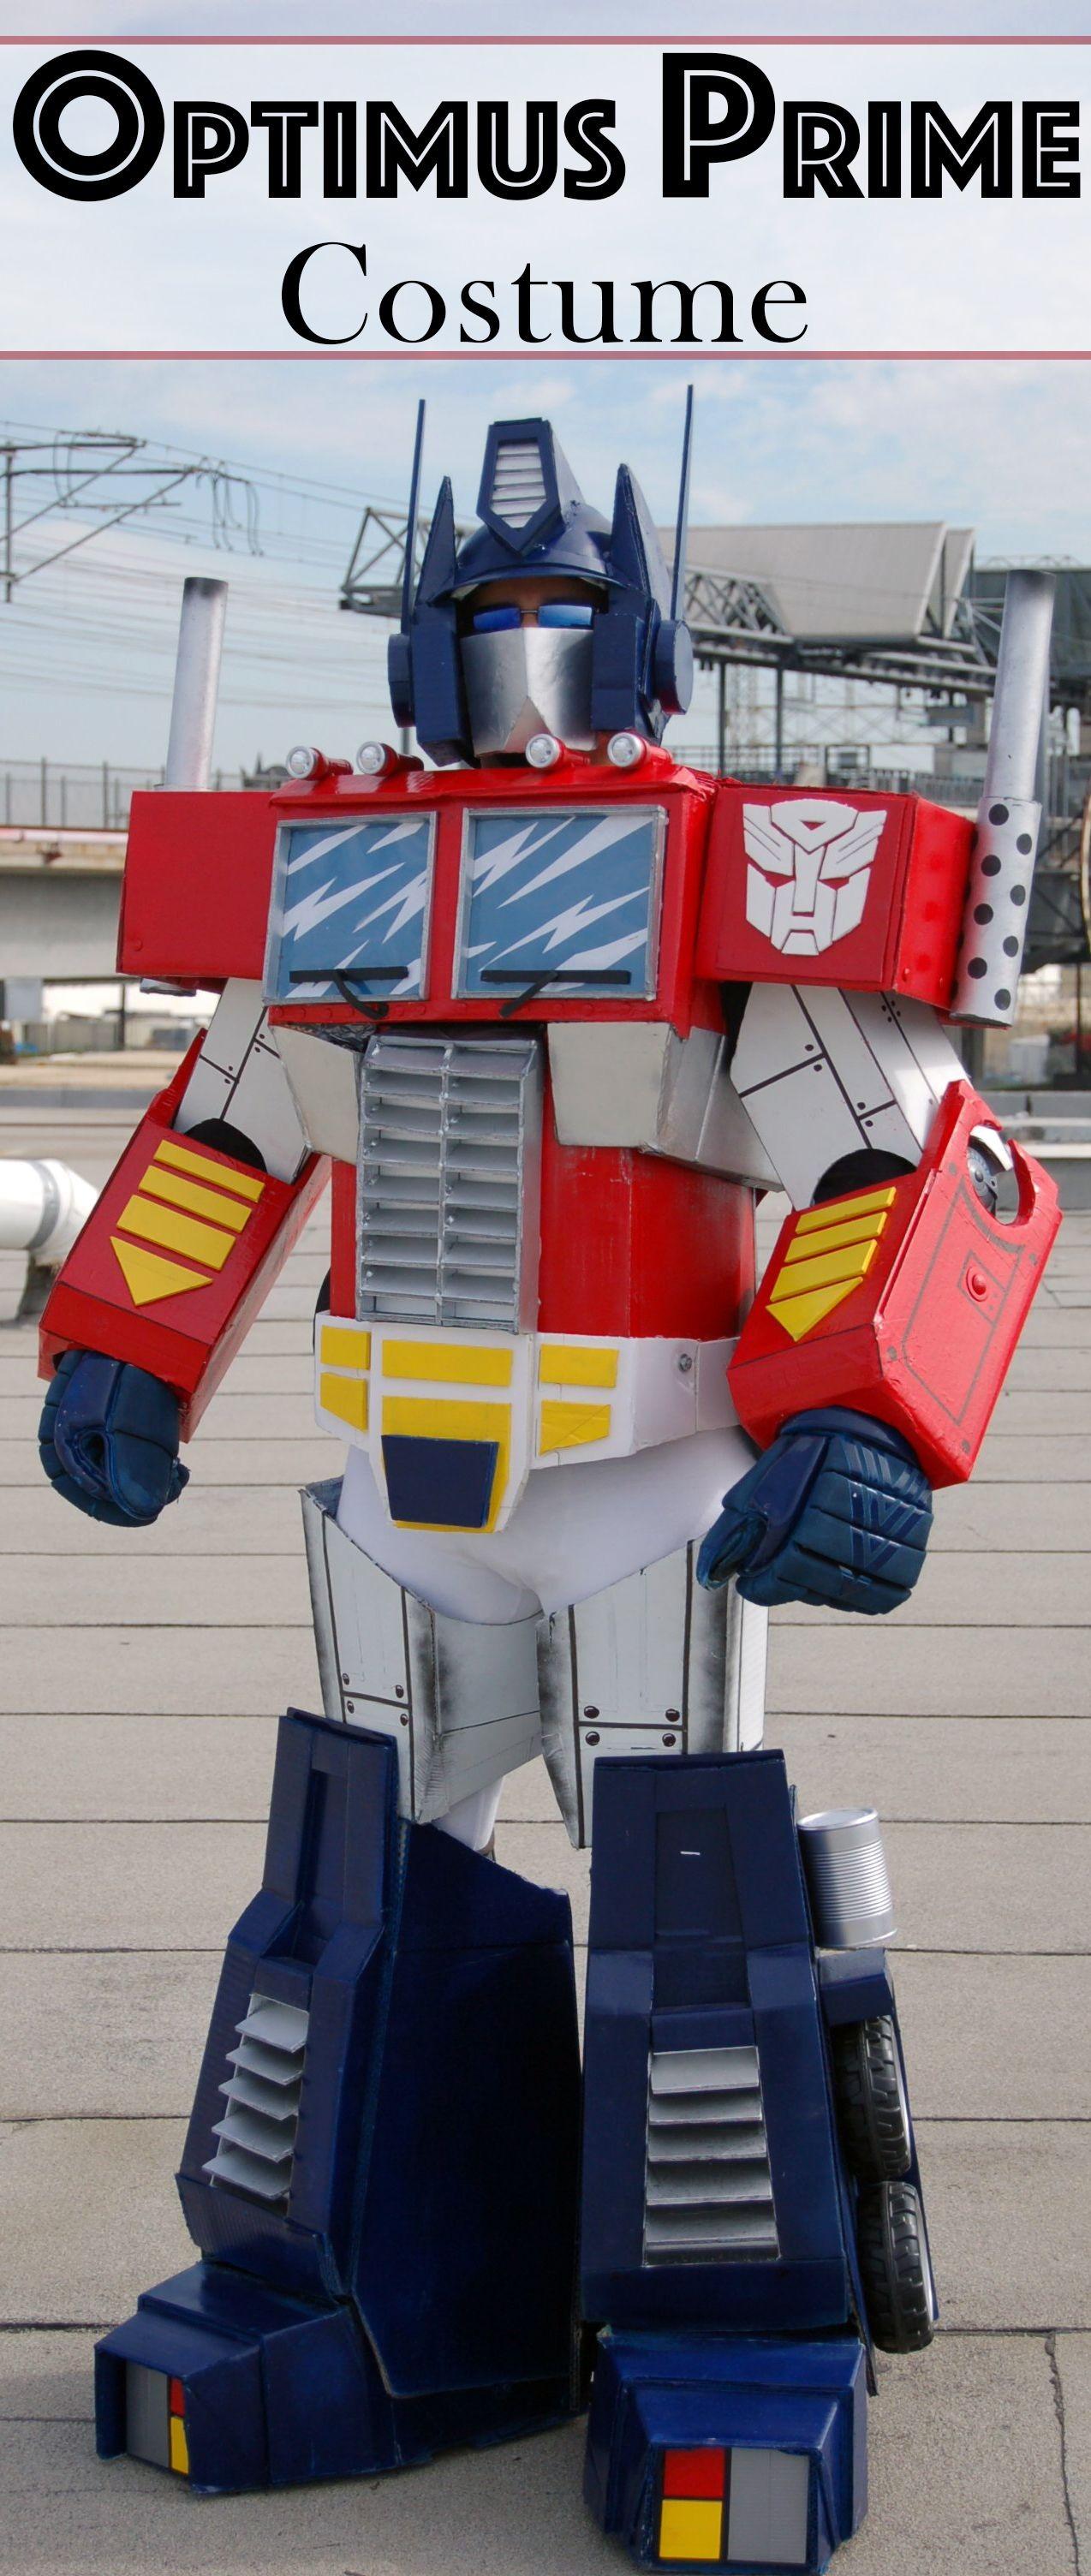 Transformers Papercraft Optimus Prime Optimus Prime Costume Armor N Props Pinterest